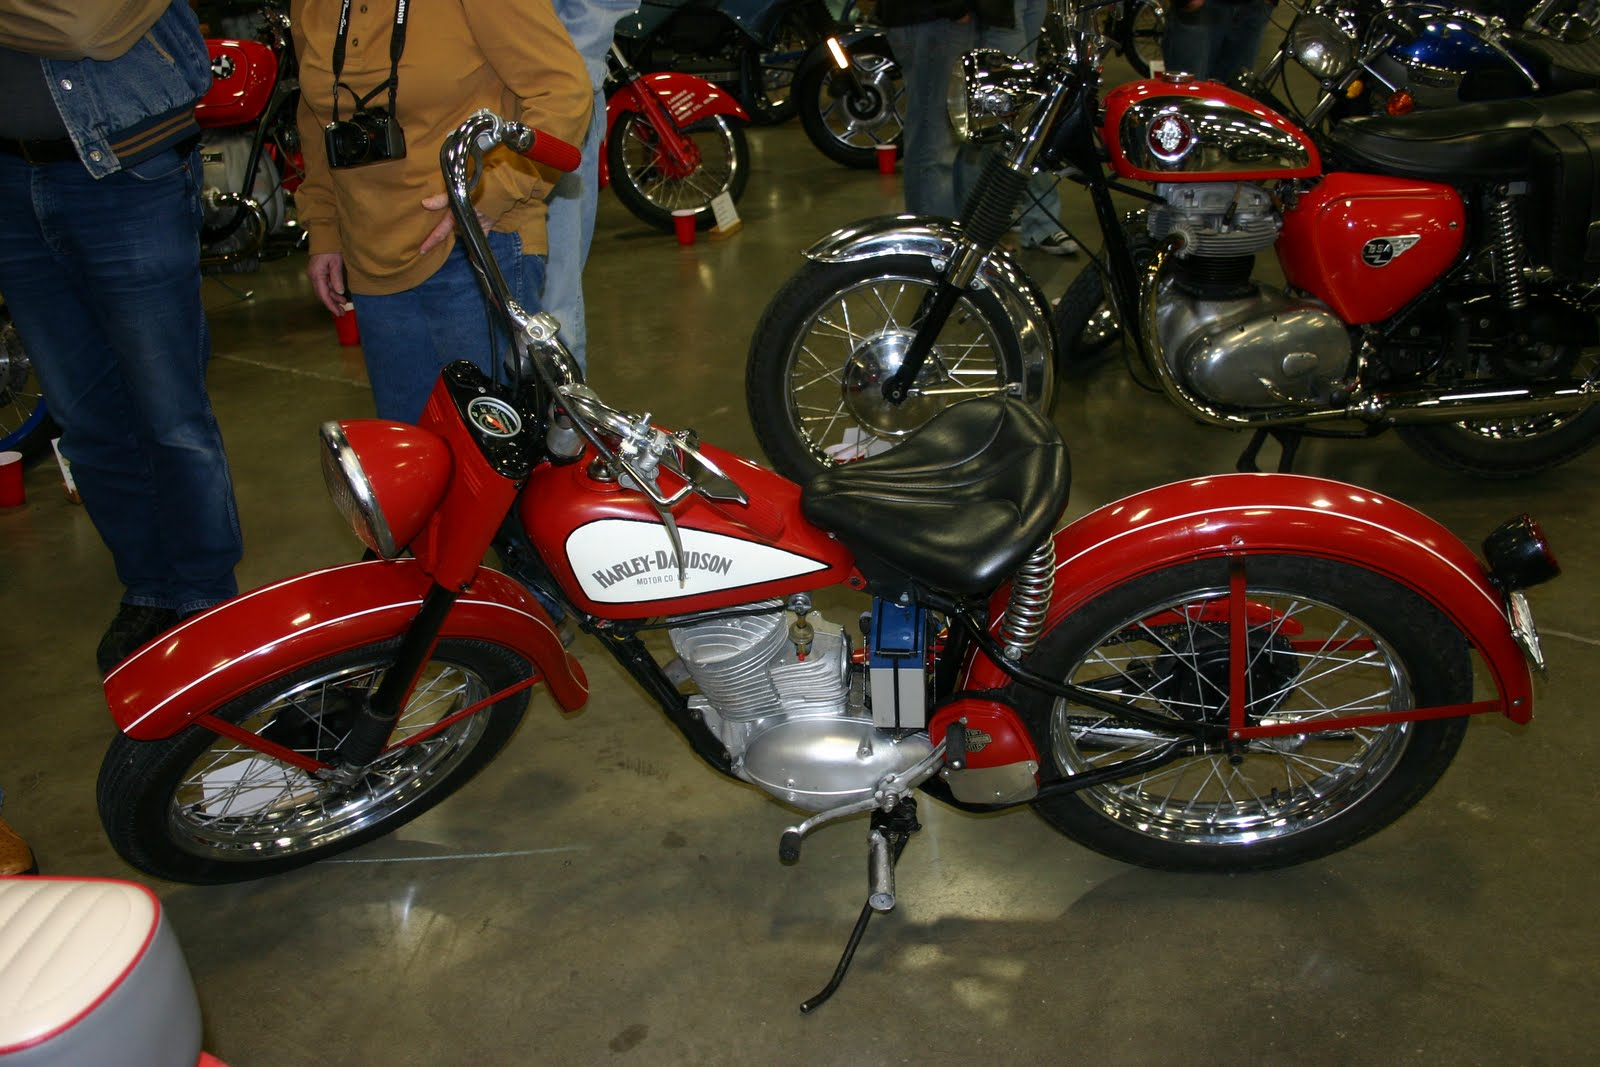 1974 Honda 90cc Motor Cycle Street Bike - Motor Cycle